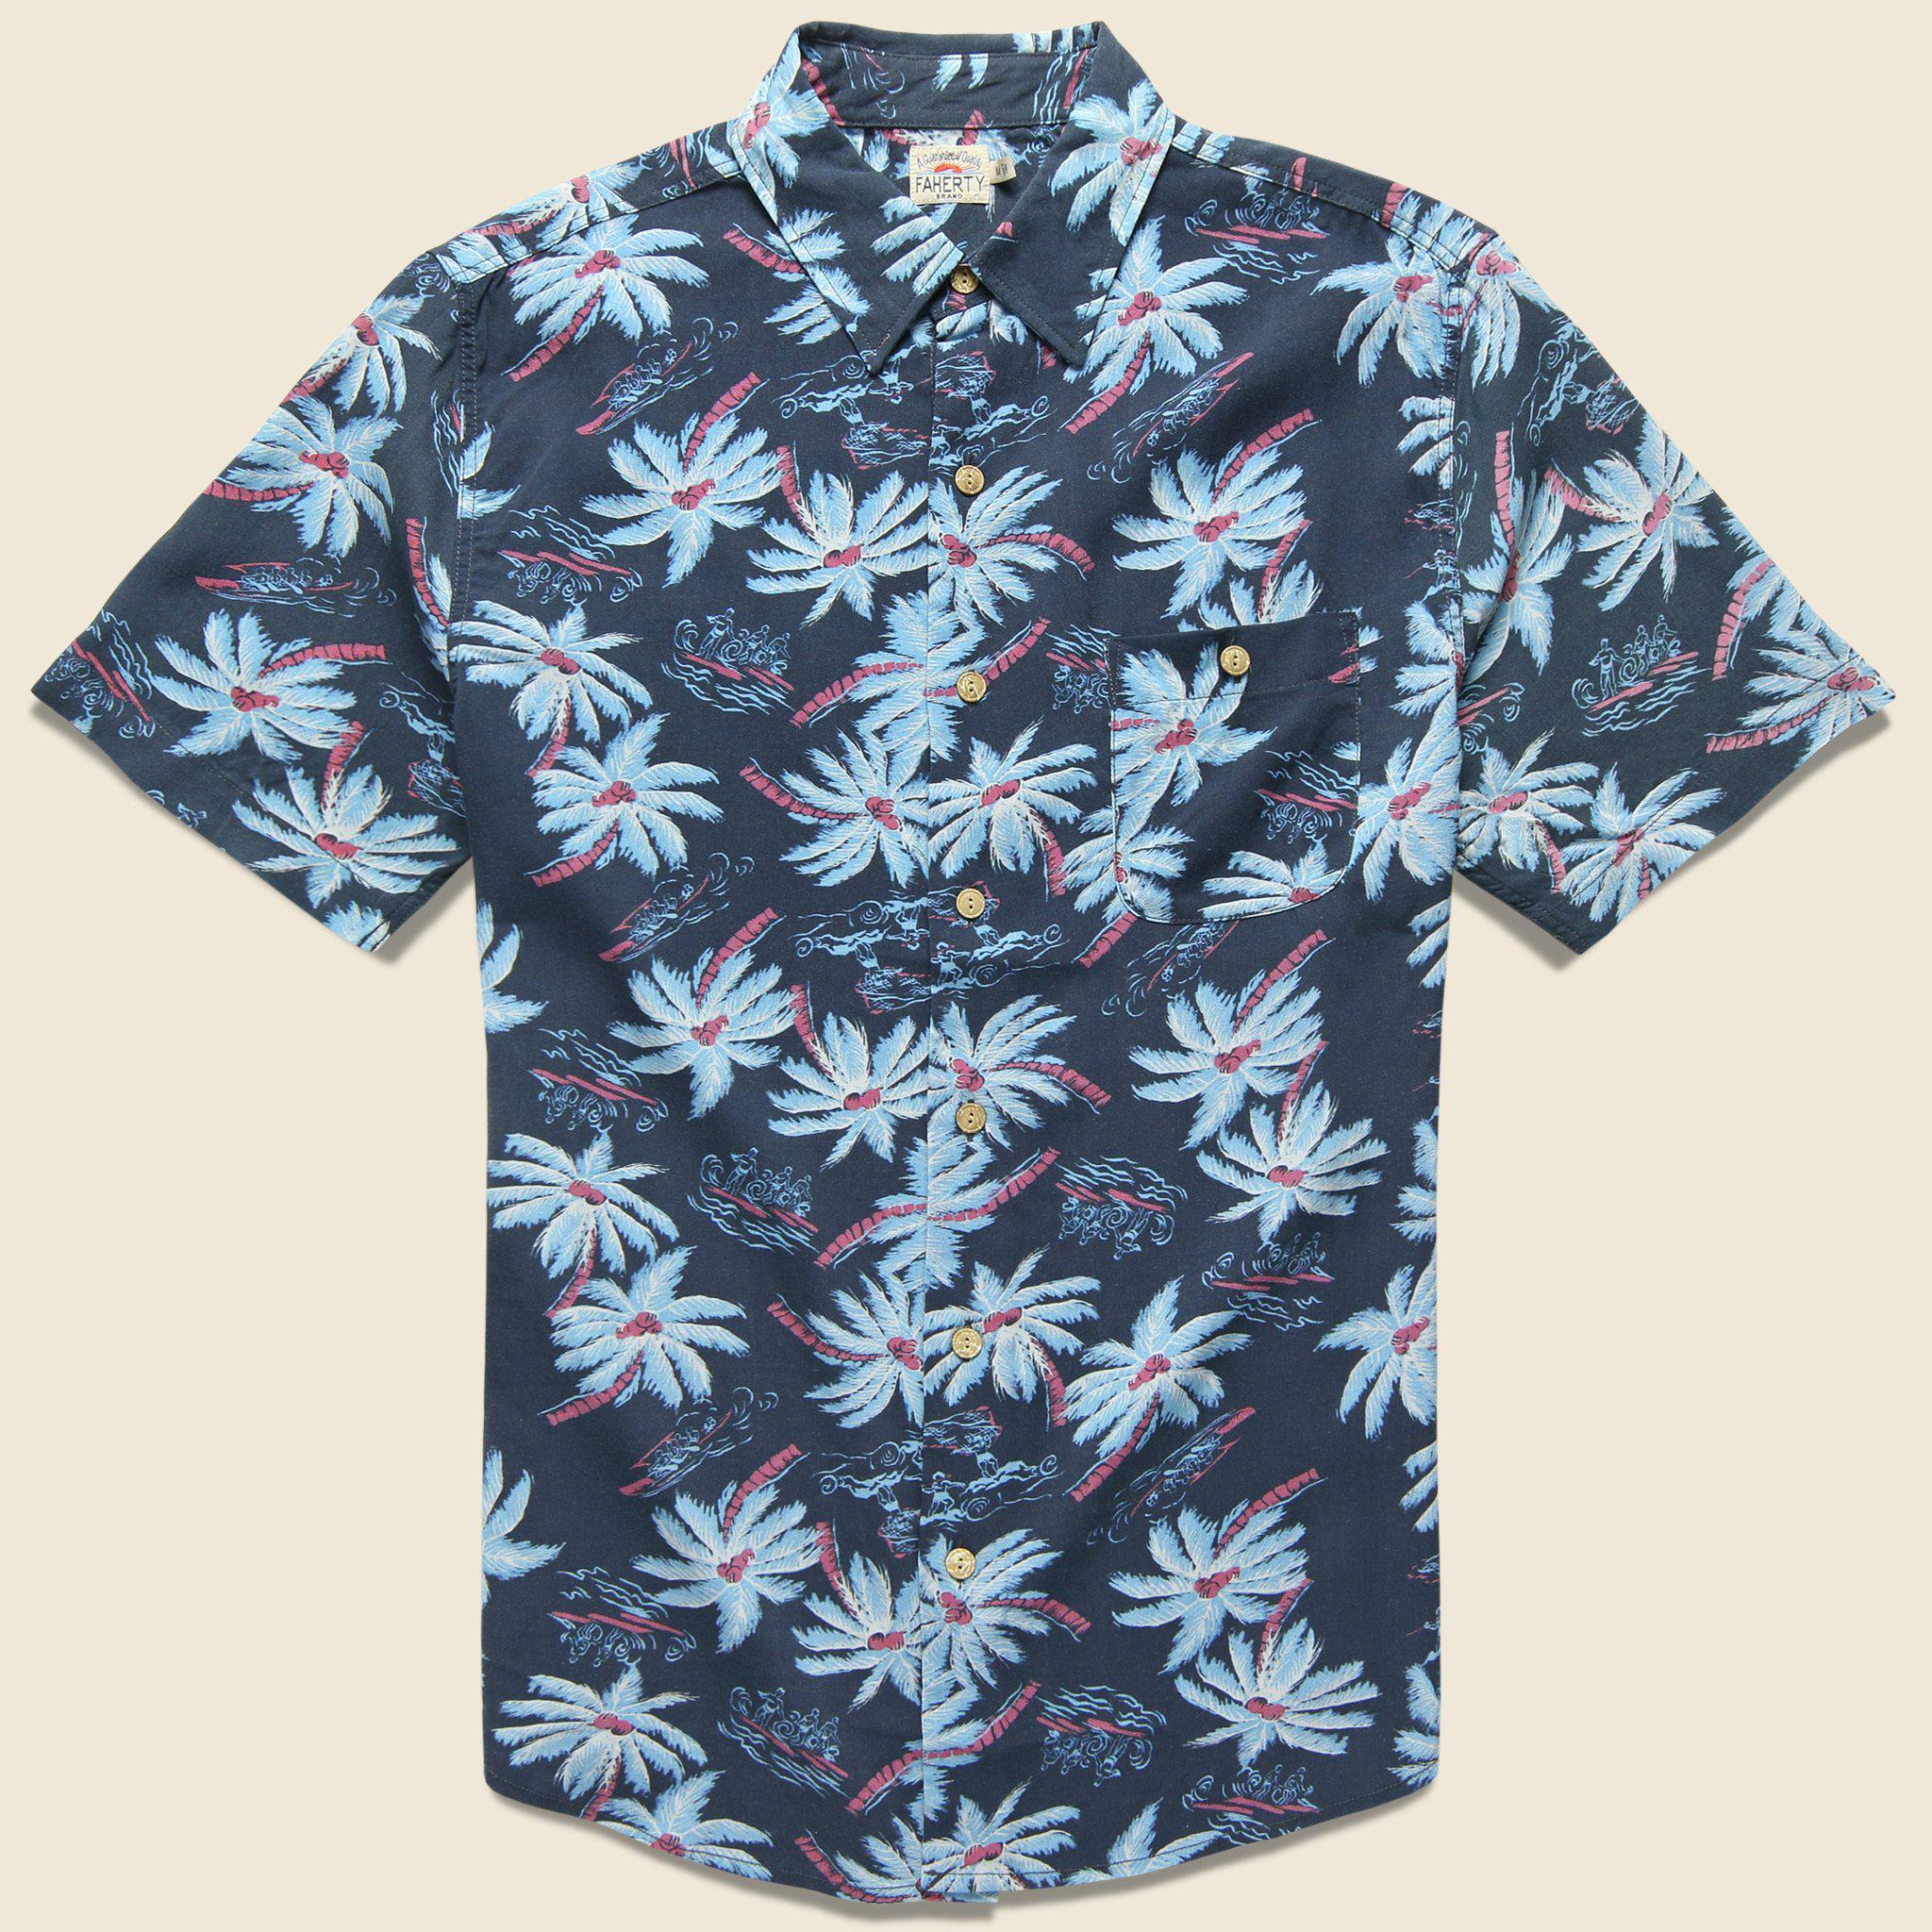 3990a2e5 Faherty Brand Rayon Hawaiian Shirt - Midnight Palm in Blue for Men ...